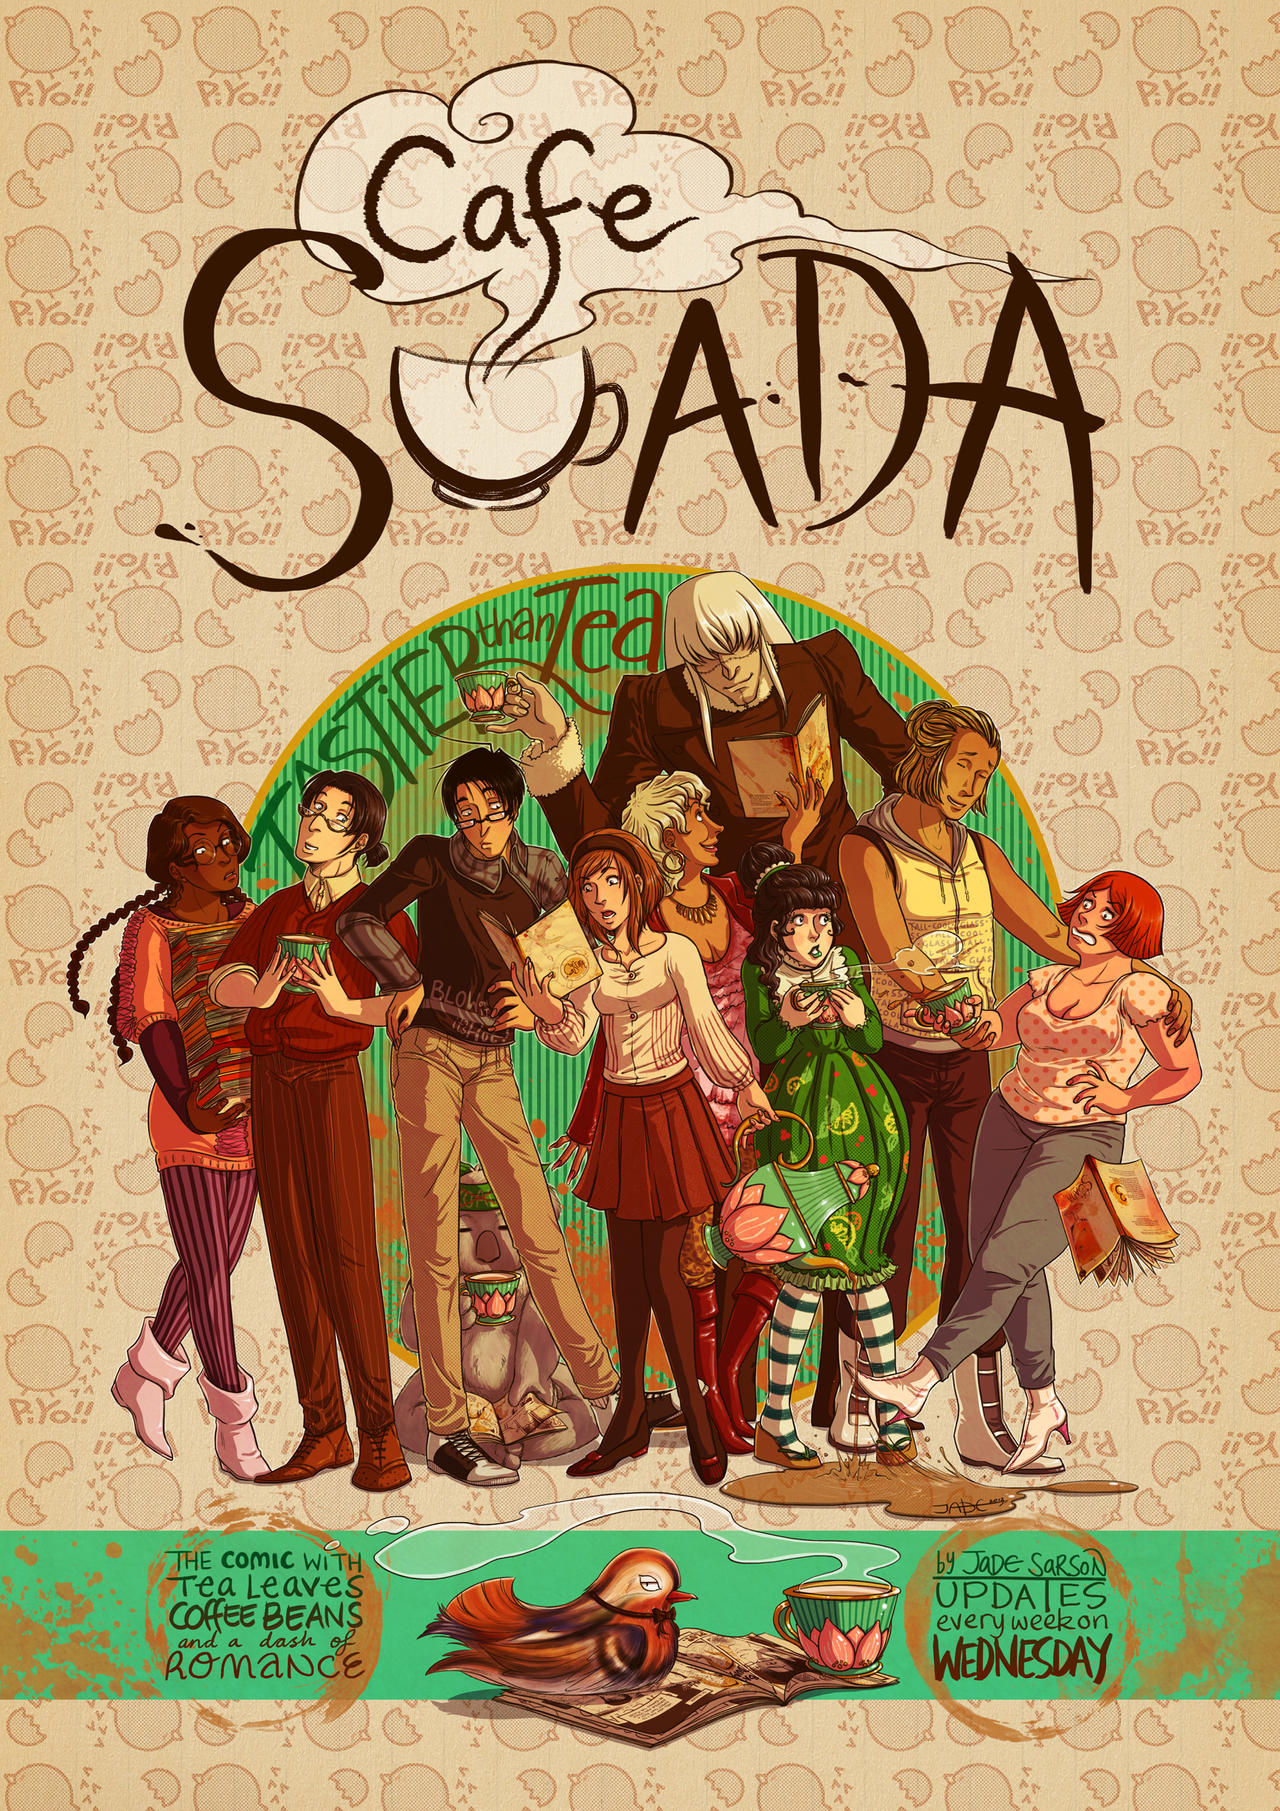 Cafe Suada Poster 2013 by Lycorisu